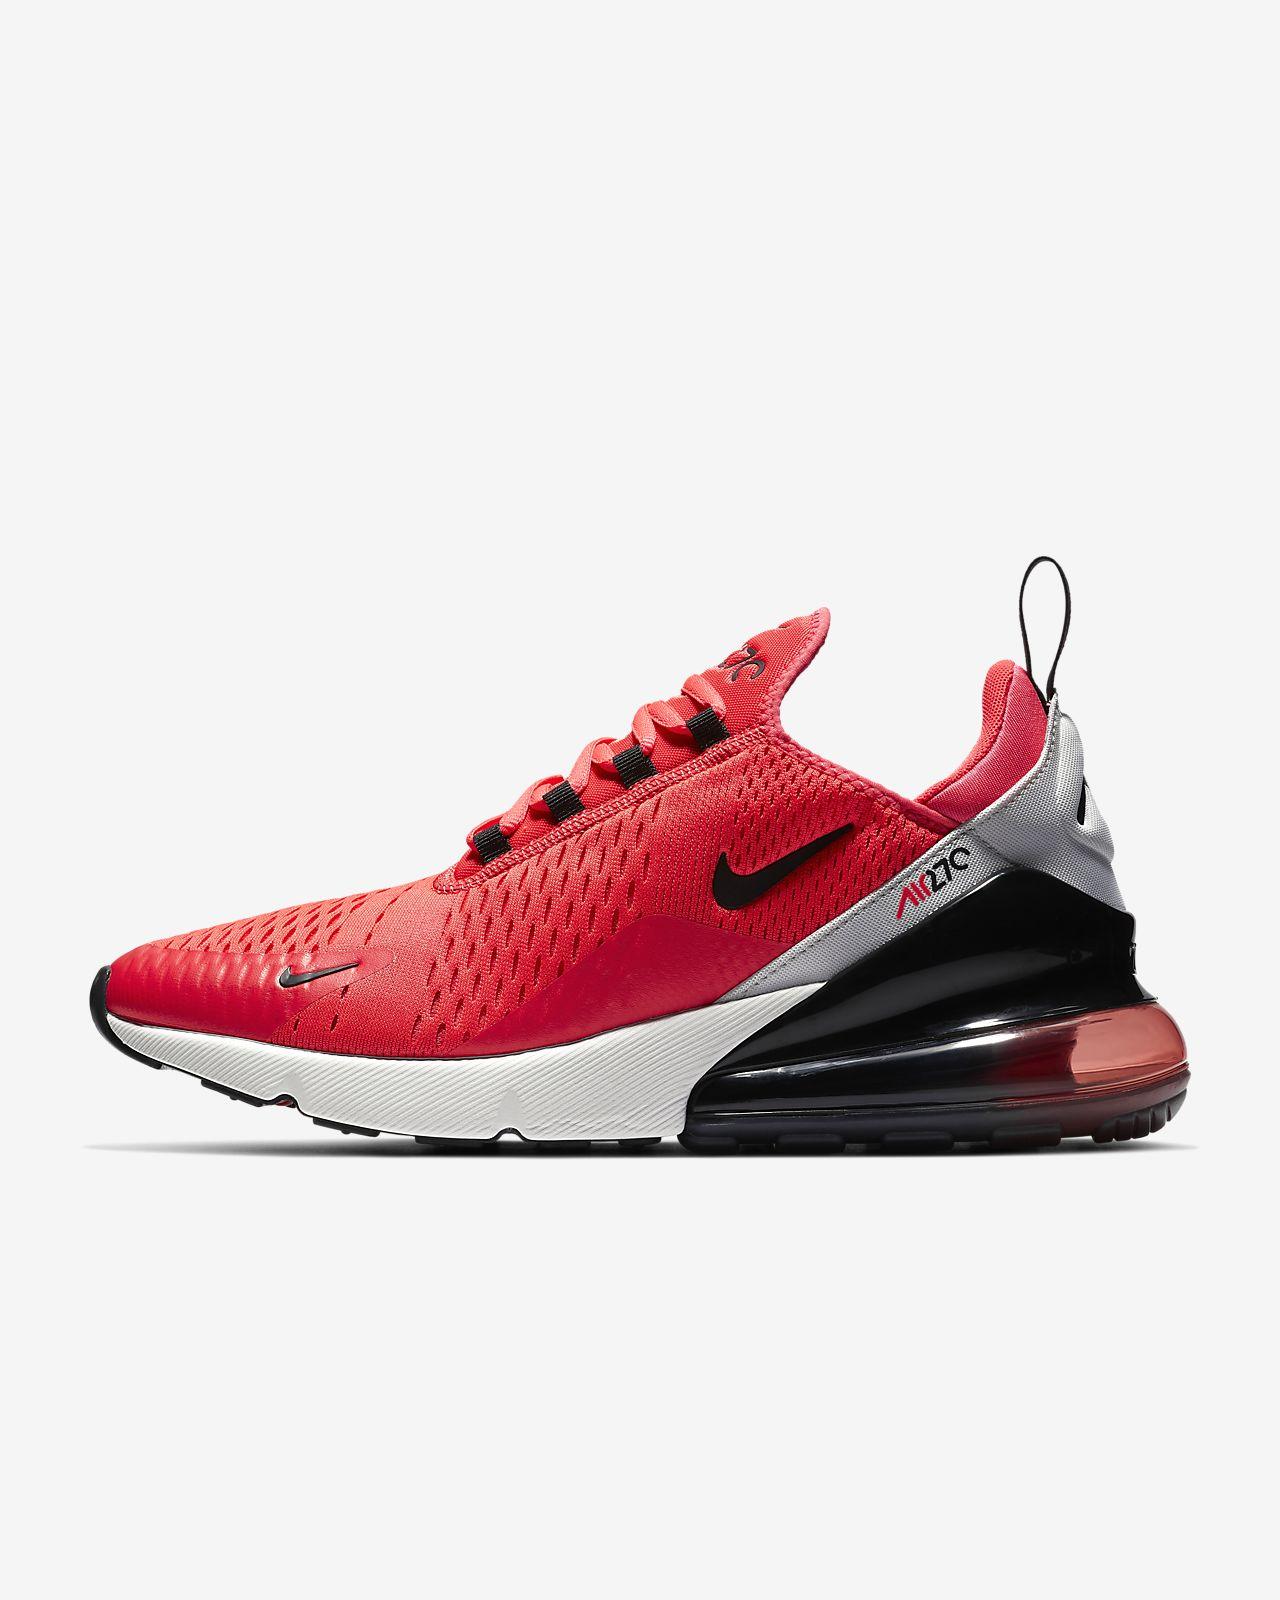 the best attitude d5f9d 257fa Nike Air Max 270 Men's Shoe